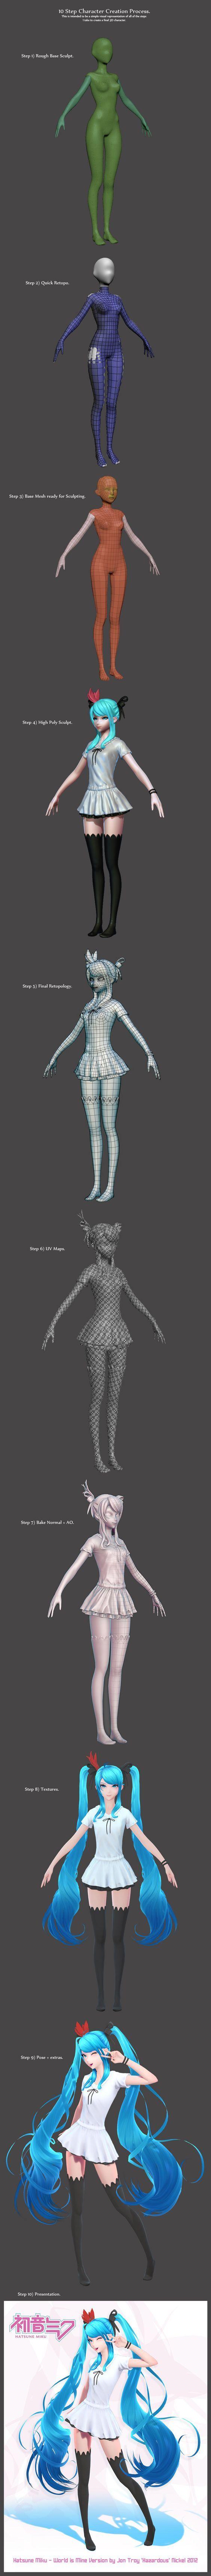 3D Character Creation #3dcharacter